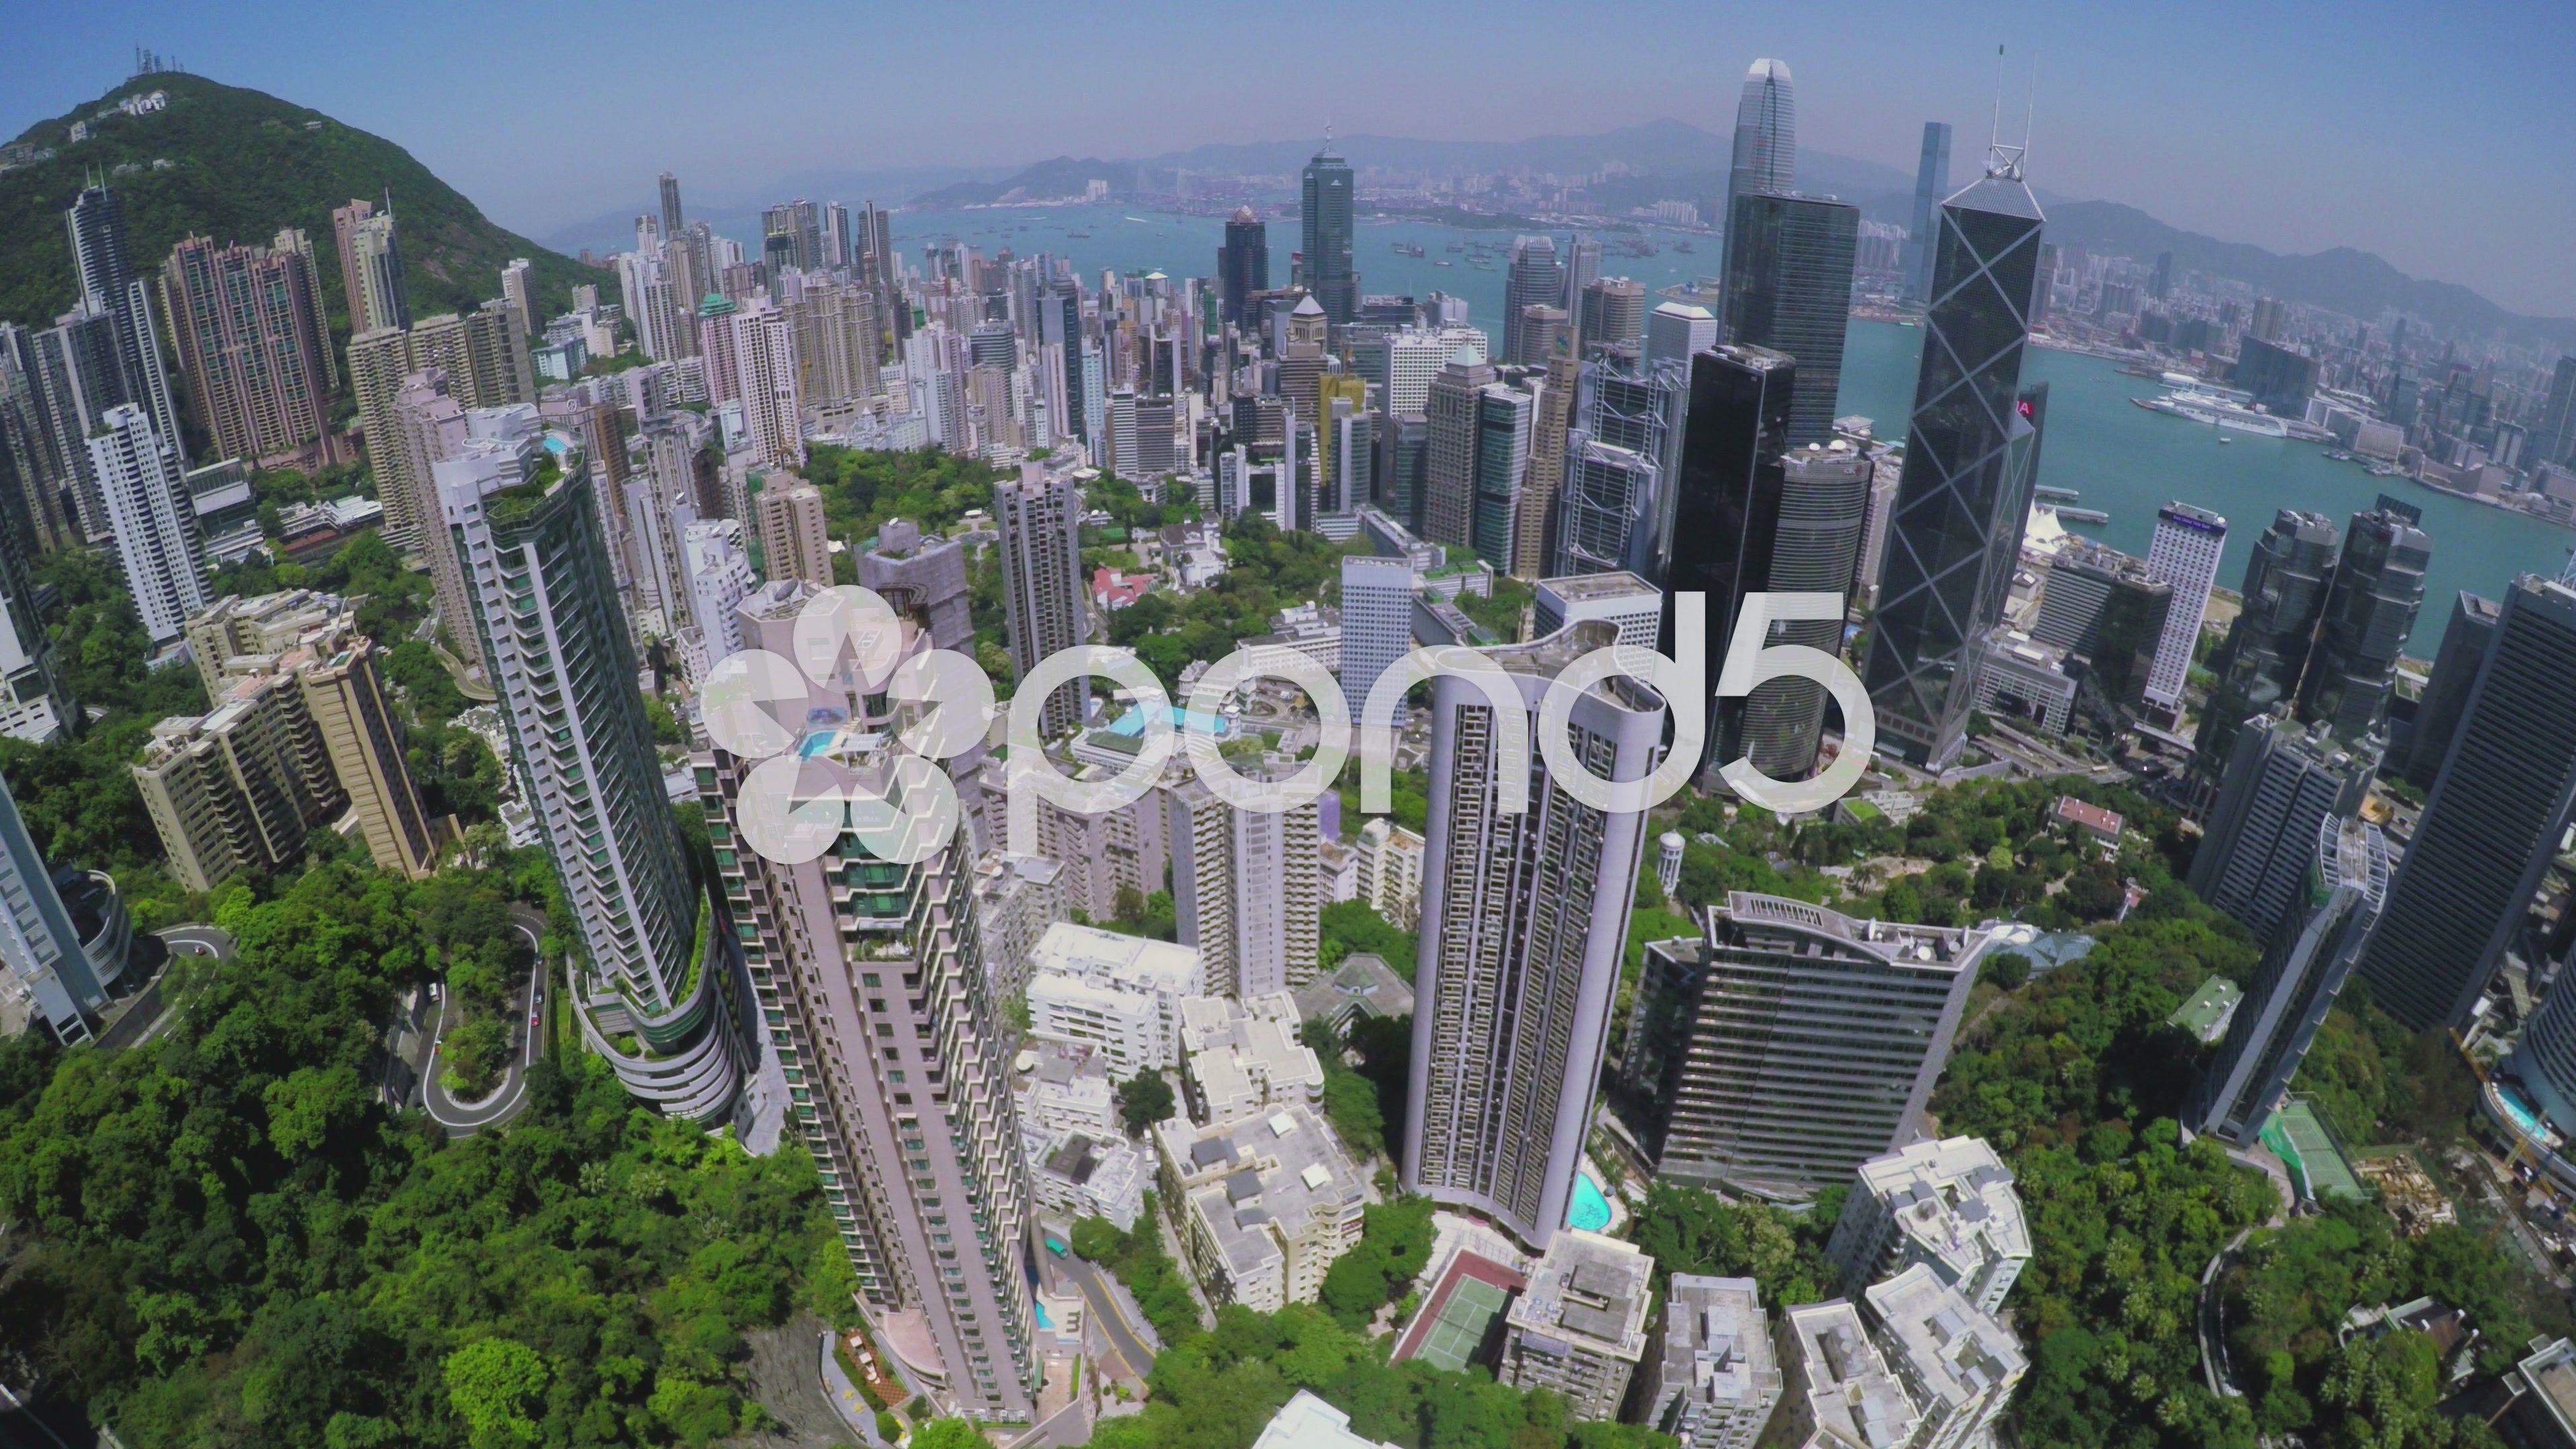 Hong Kong City Aerial Beautiful Clear Blue Sky Stock Footage Aerial Beautiful City Hong Clear Blue Sky Aerial City